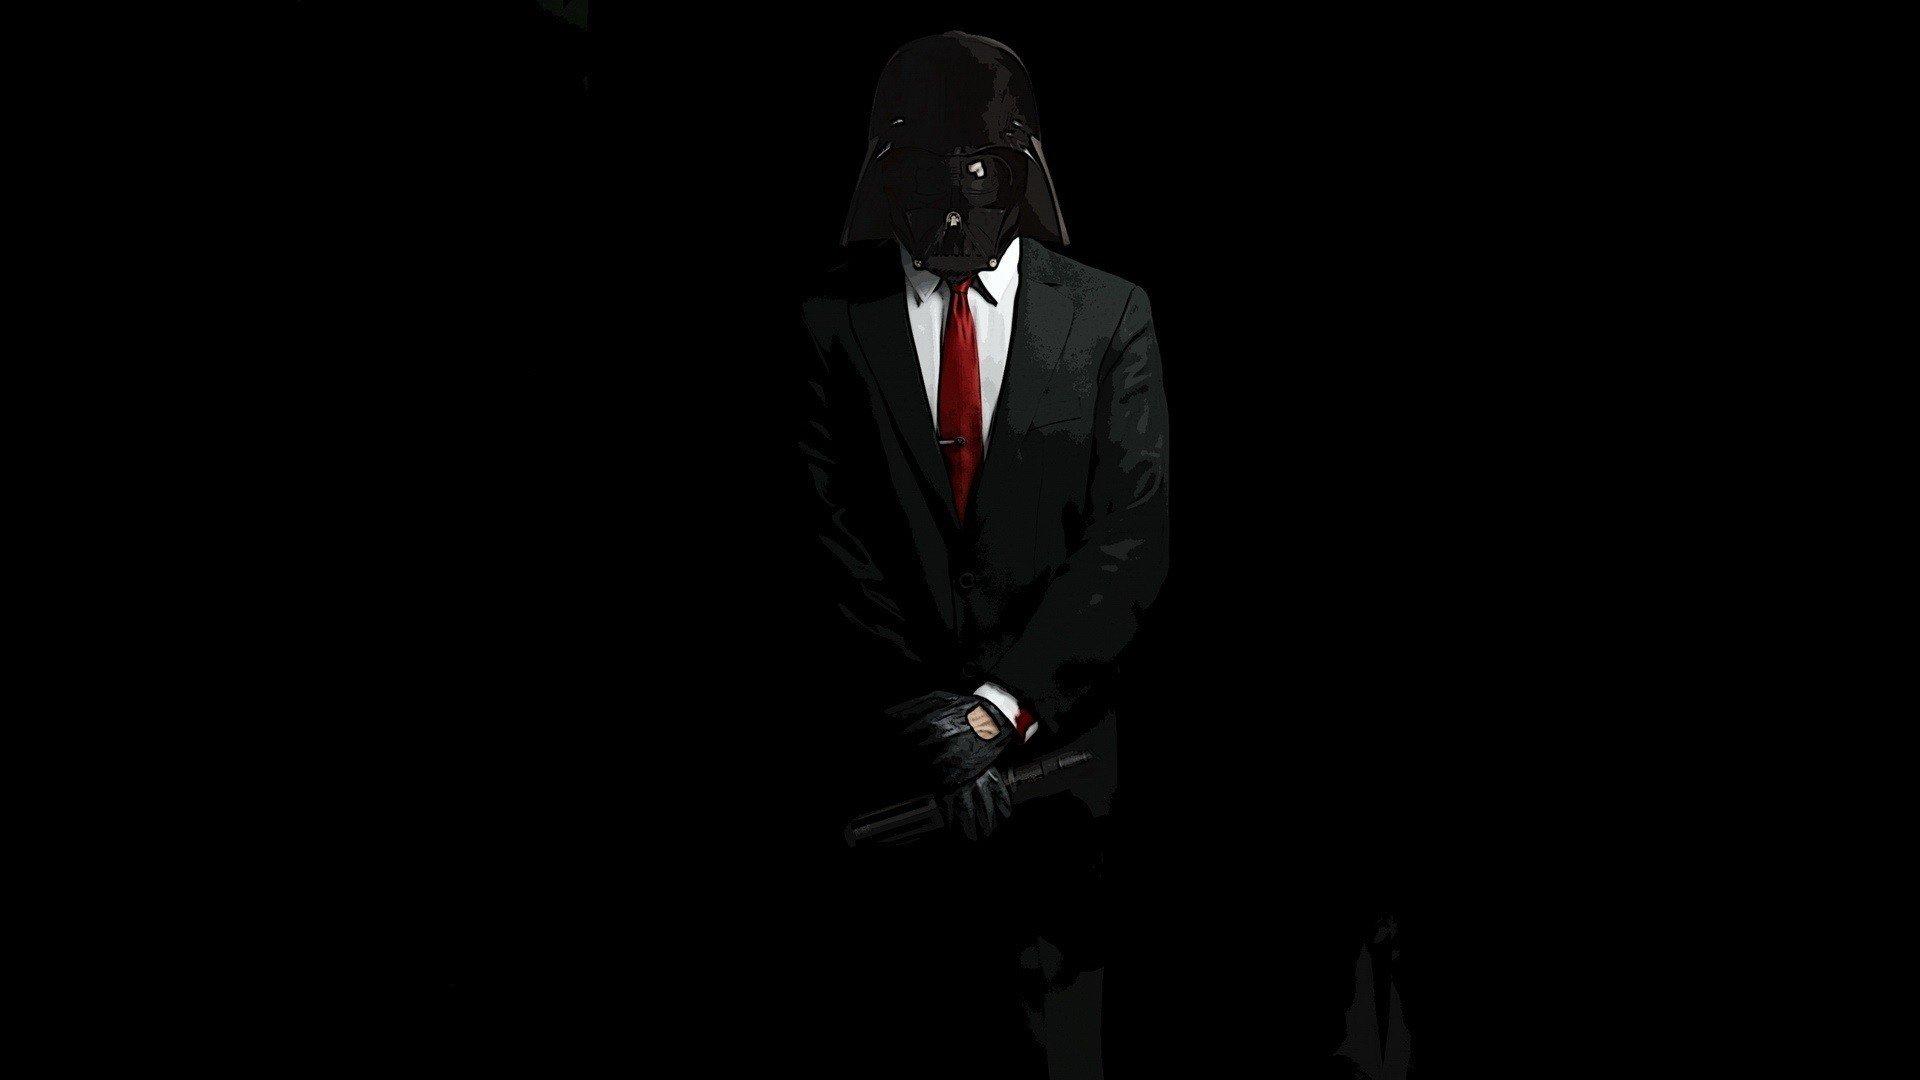 wallpaper 1920x1080 px anonymous black darth vader hitman